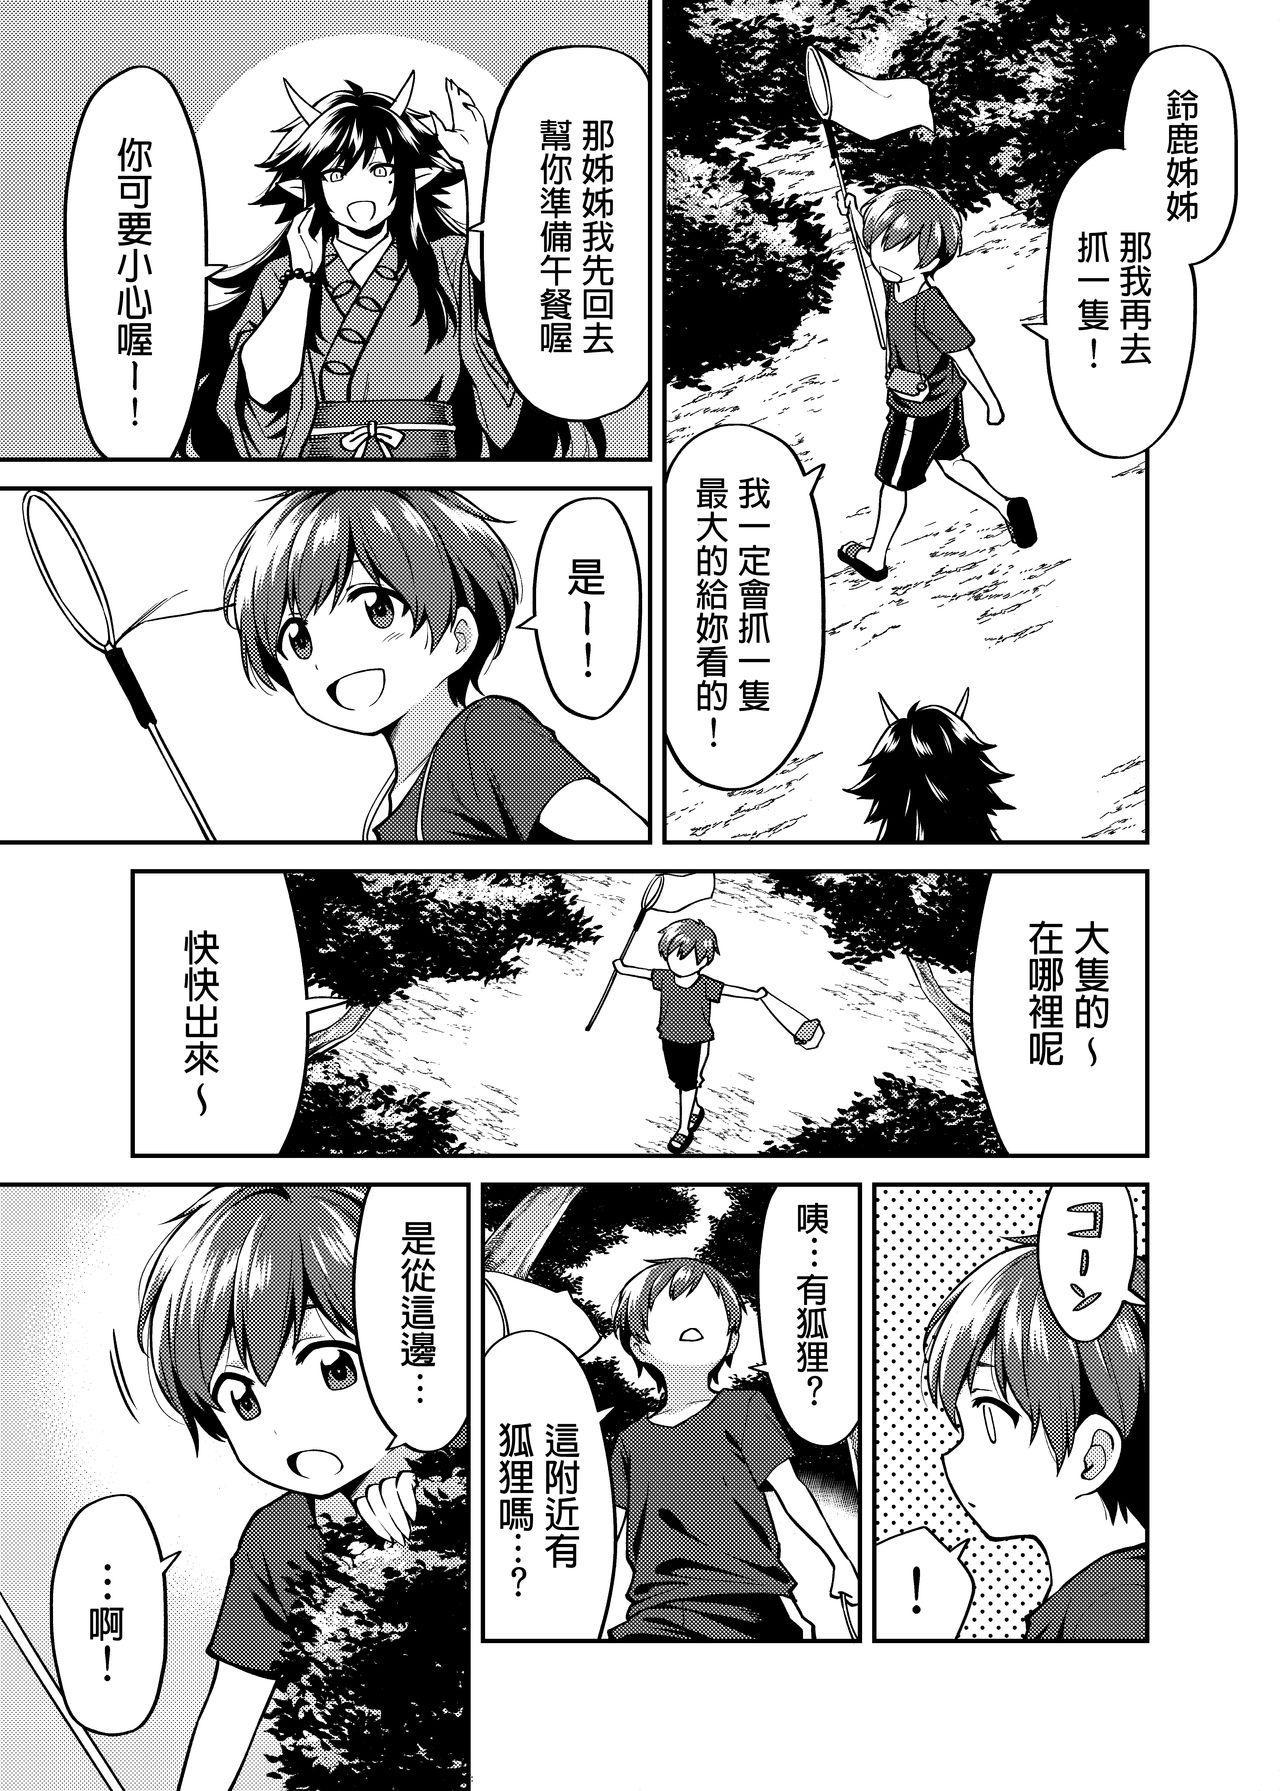 Takkun to Kitsune no Onee-san 5